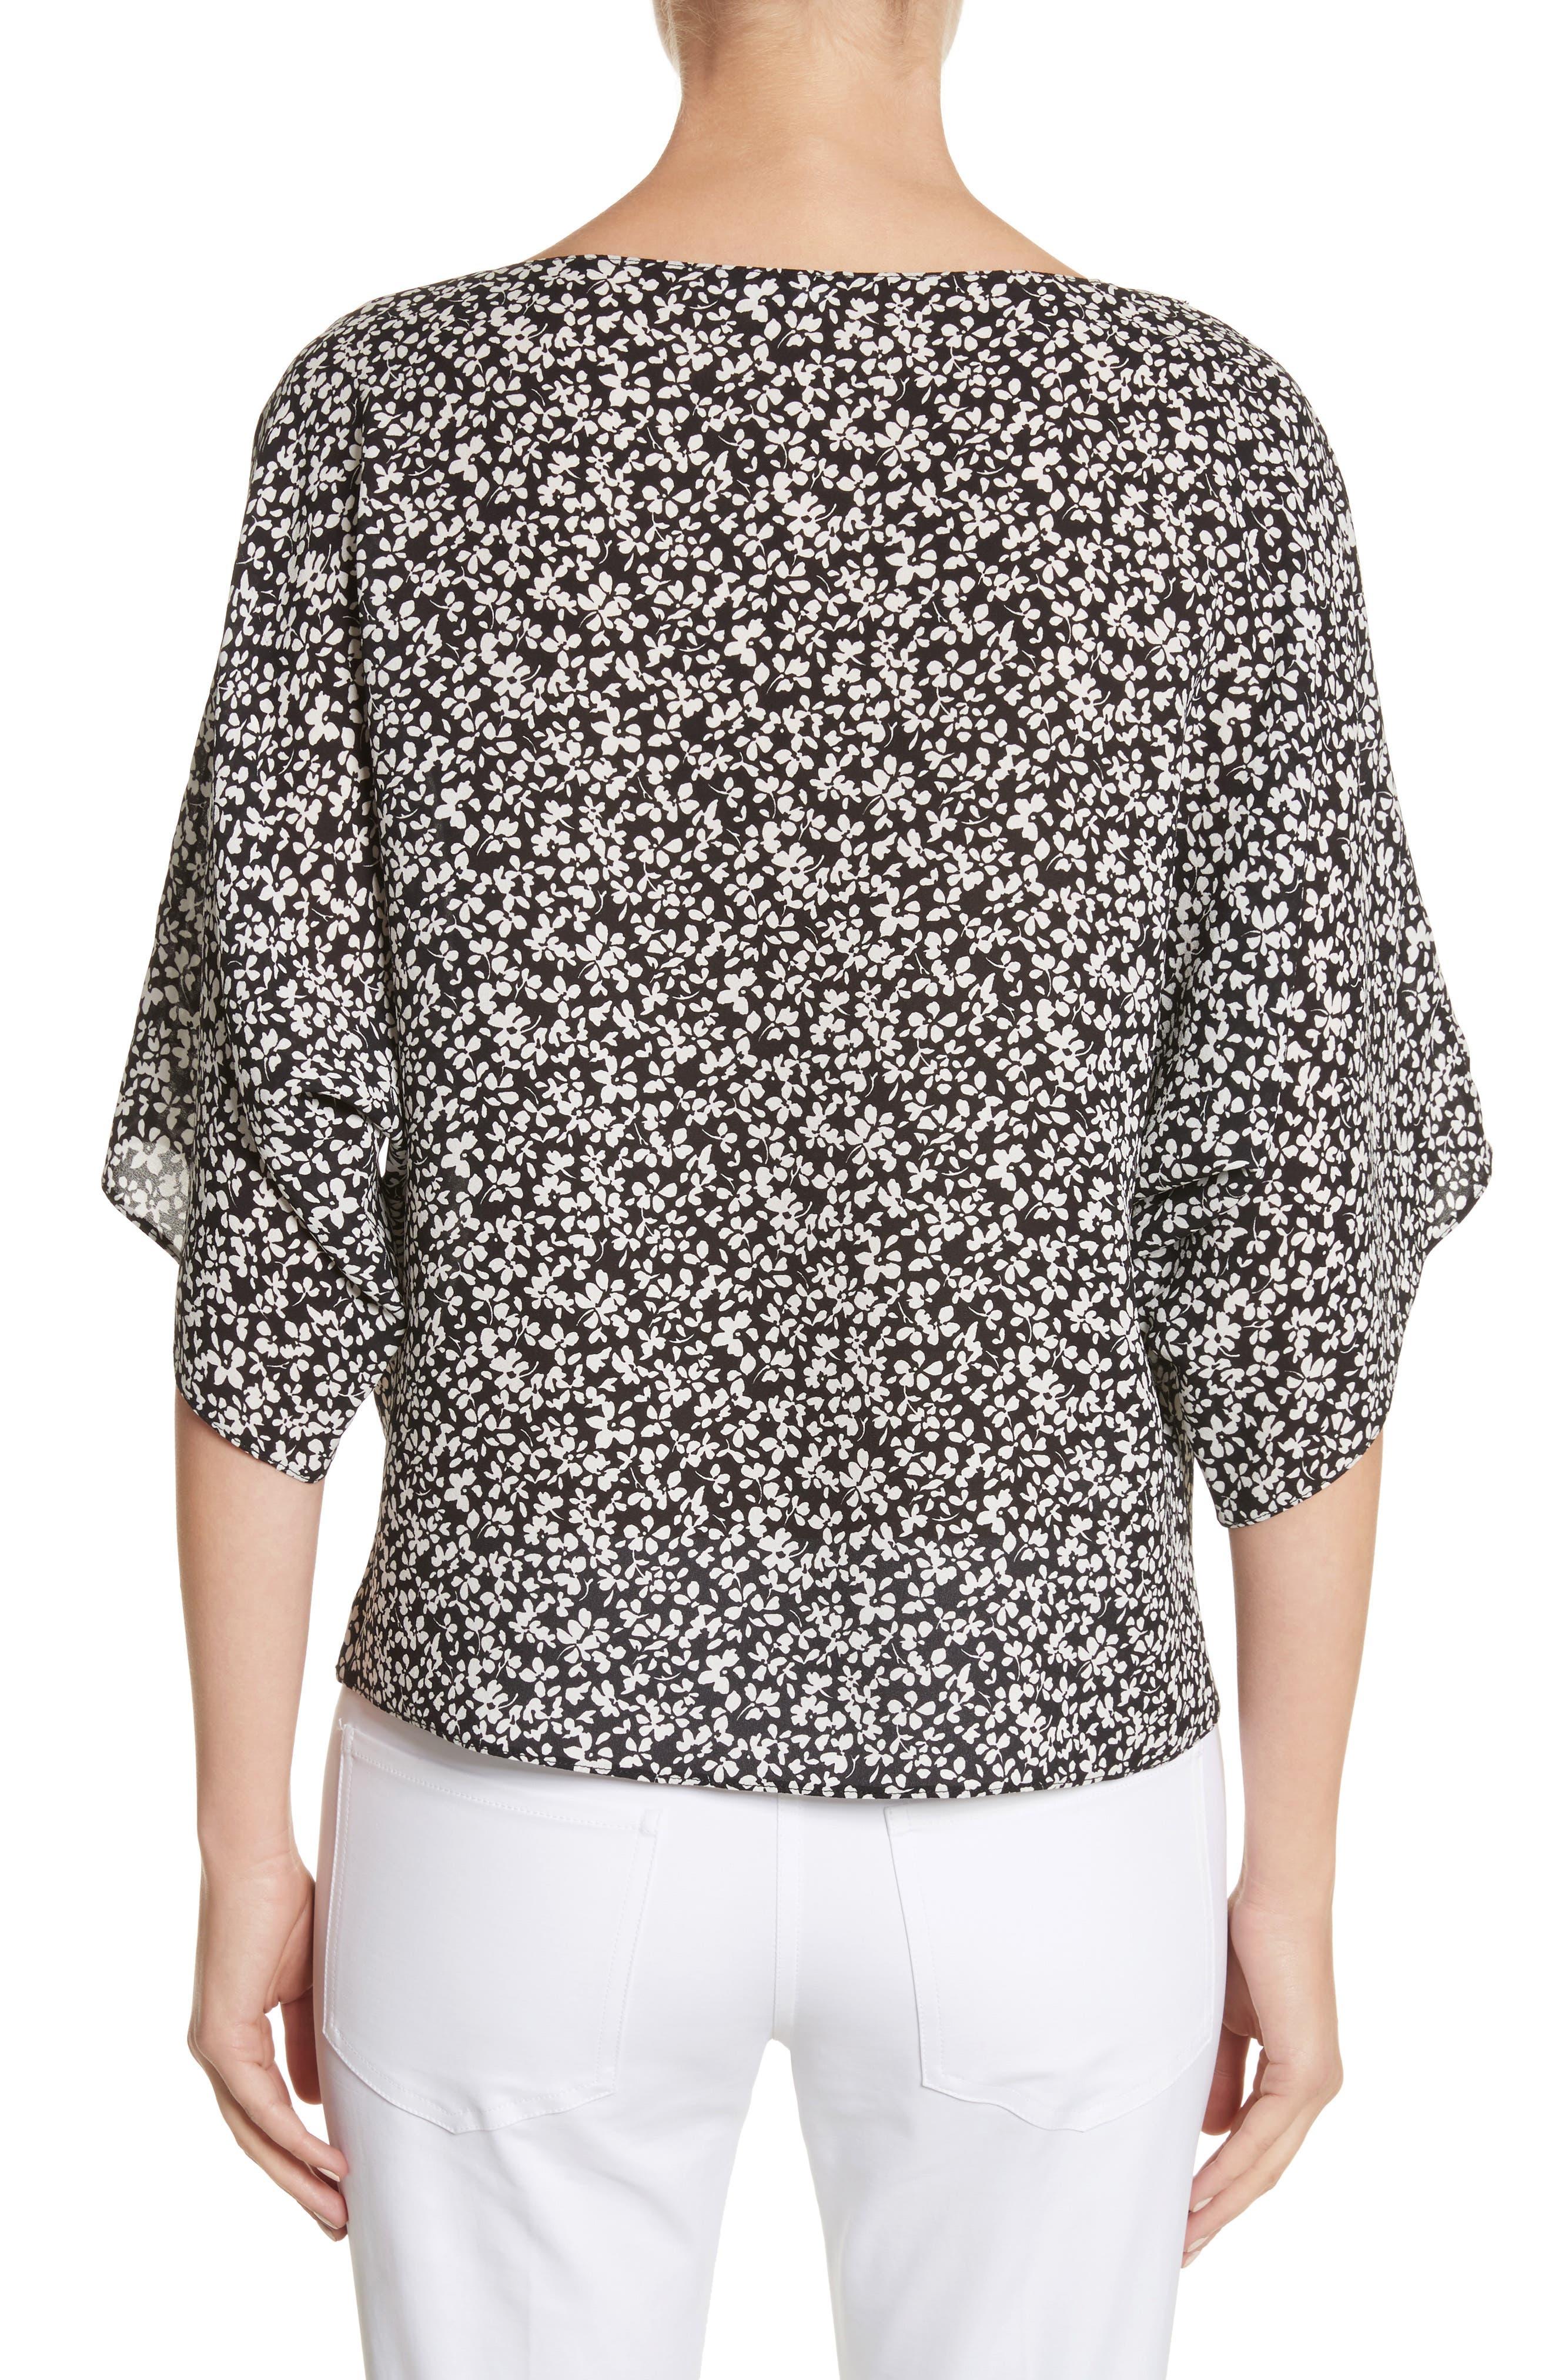 Floral Silk Blouse,                             Alternate thumbnail 2, color,                             Black/White